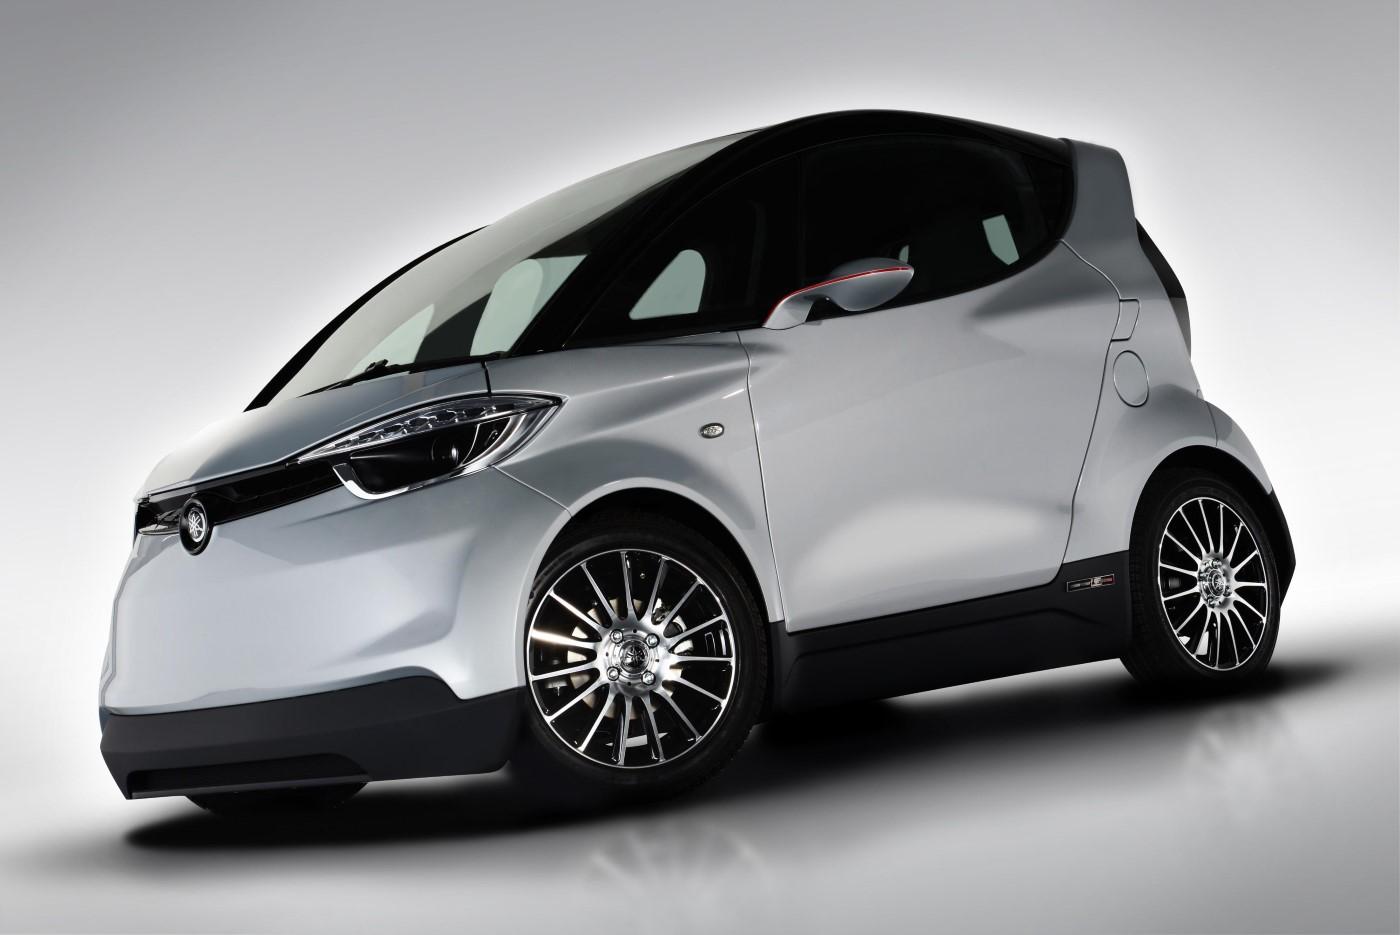 More Details On Yamaha Motiv E Electric Smart Fortwo